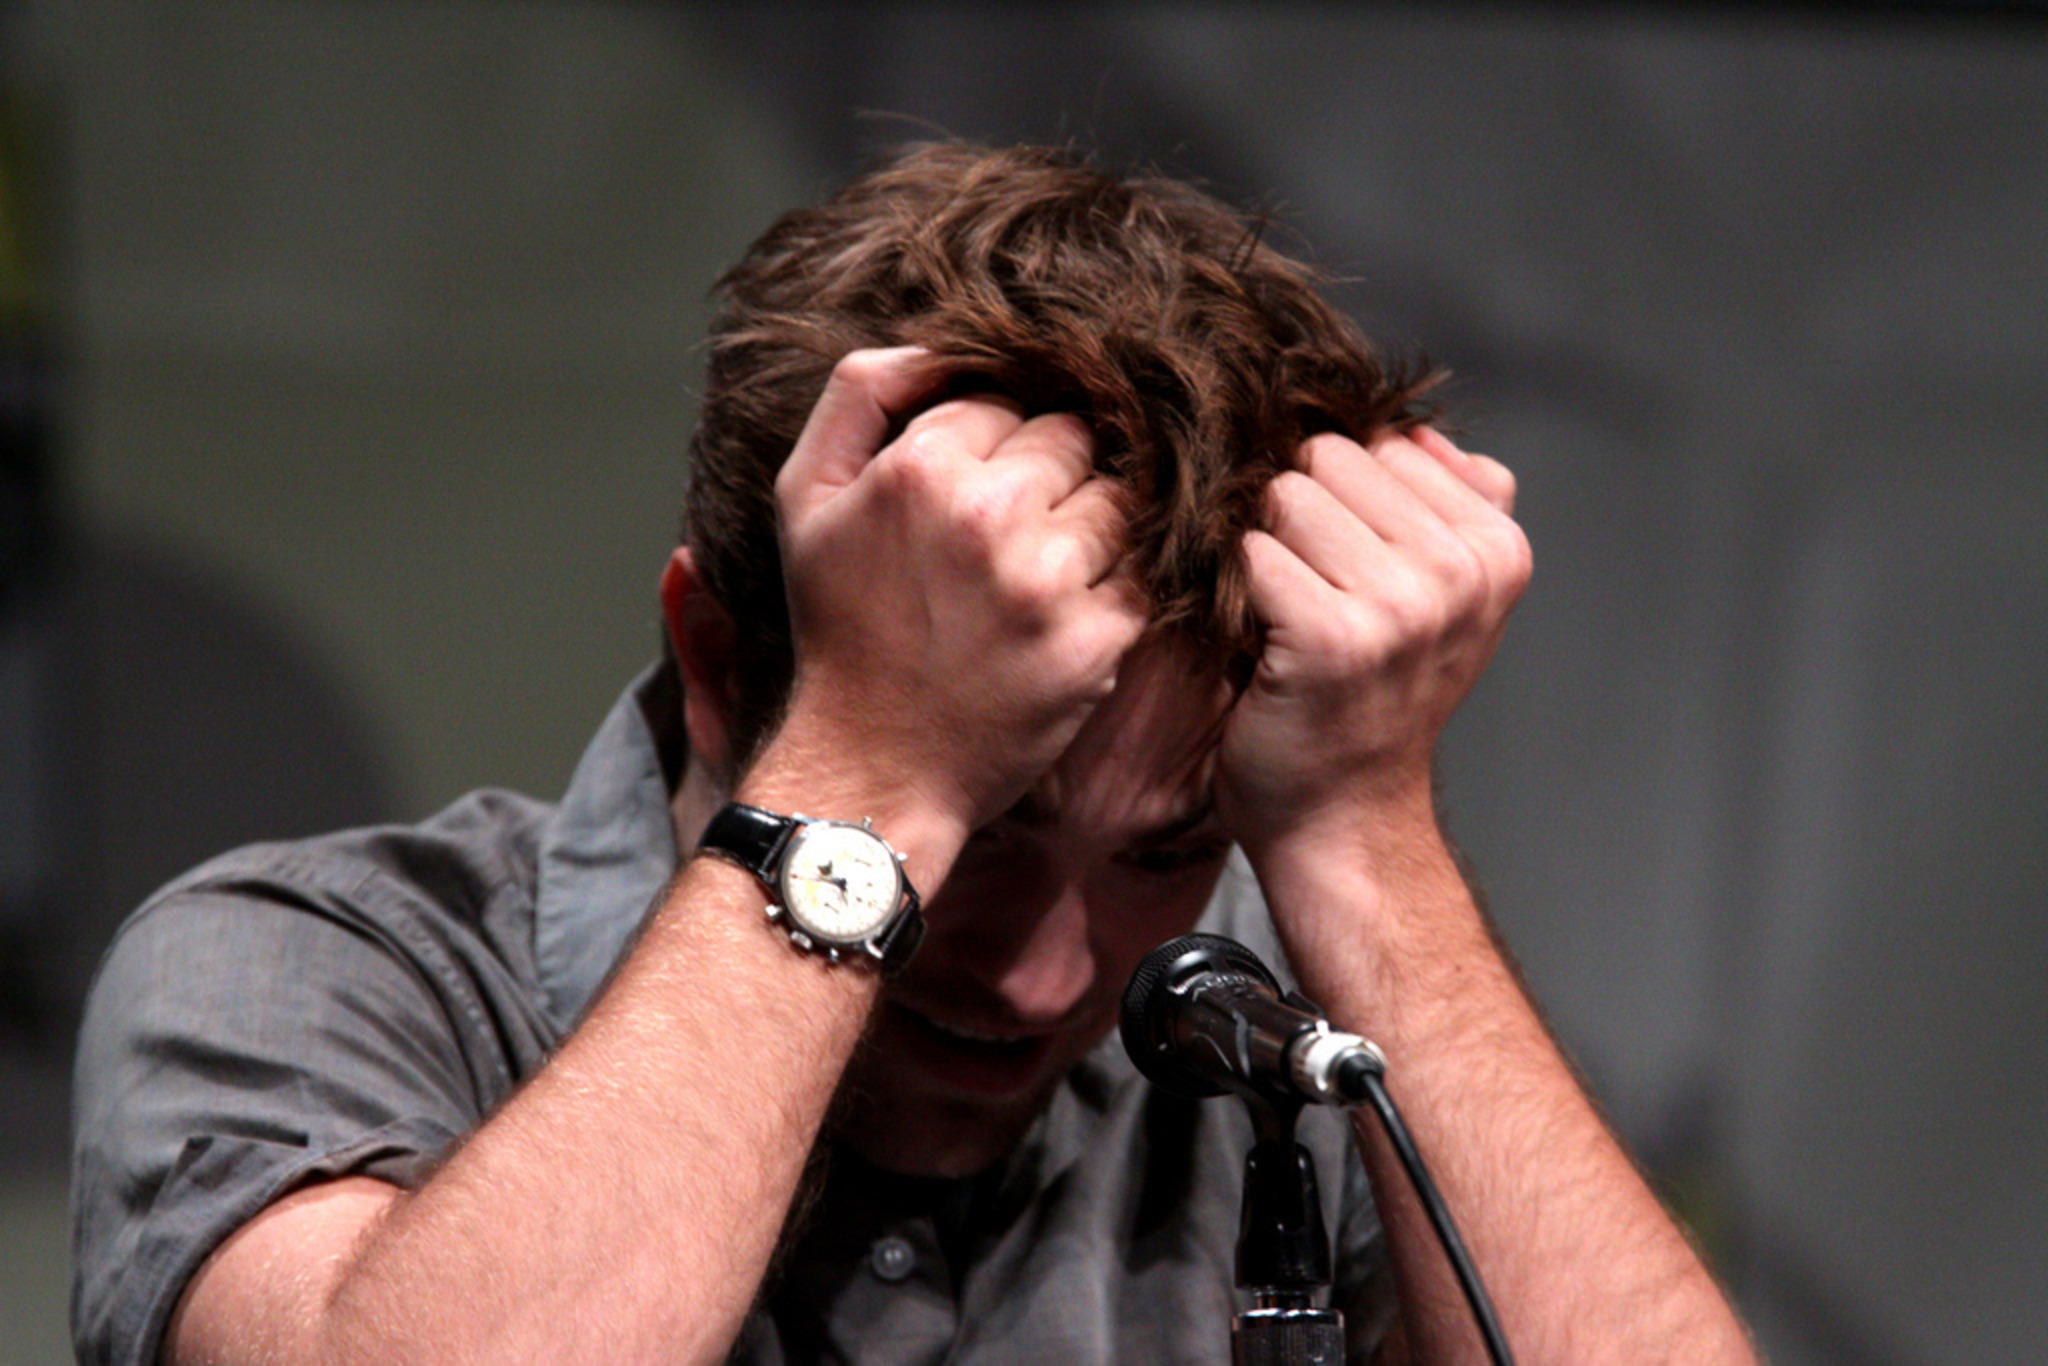 Dylan Penn dating Vampire Diaries star